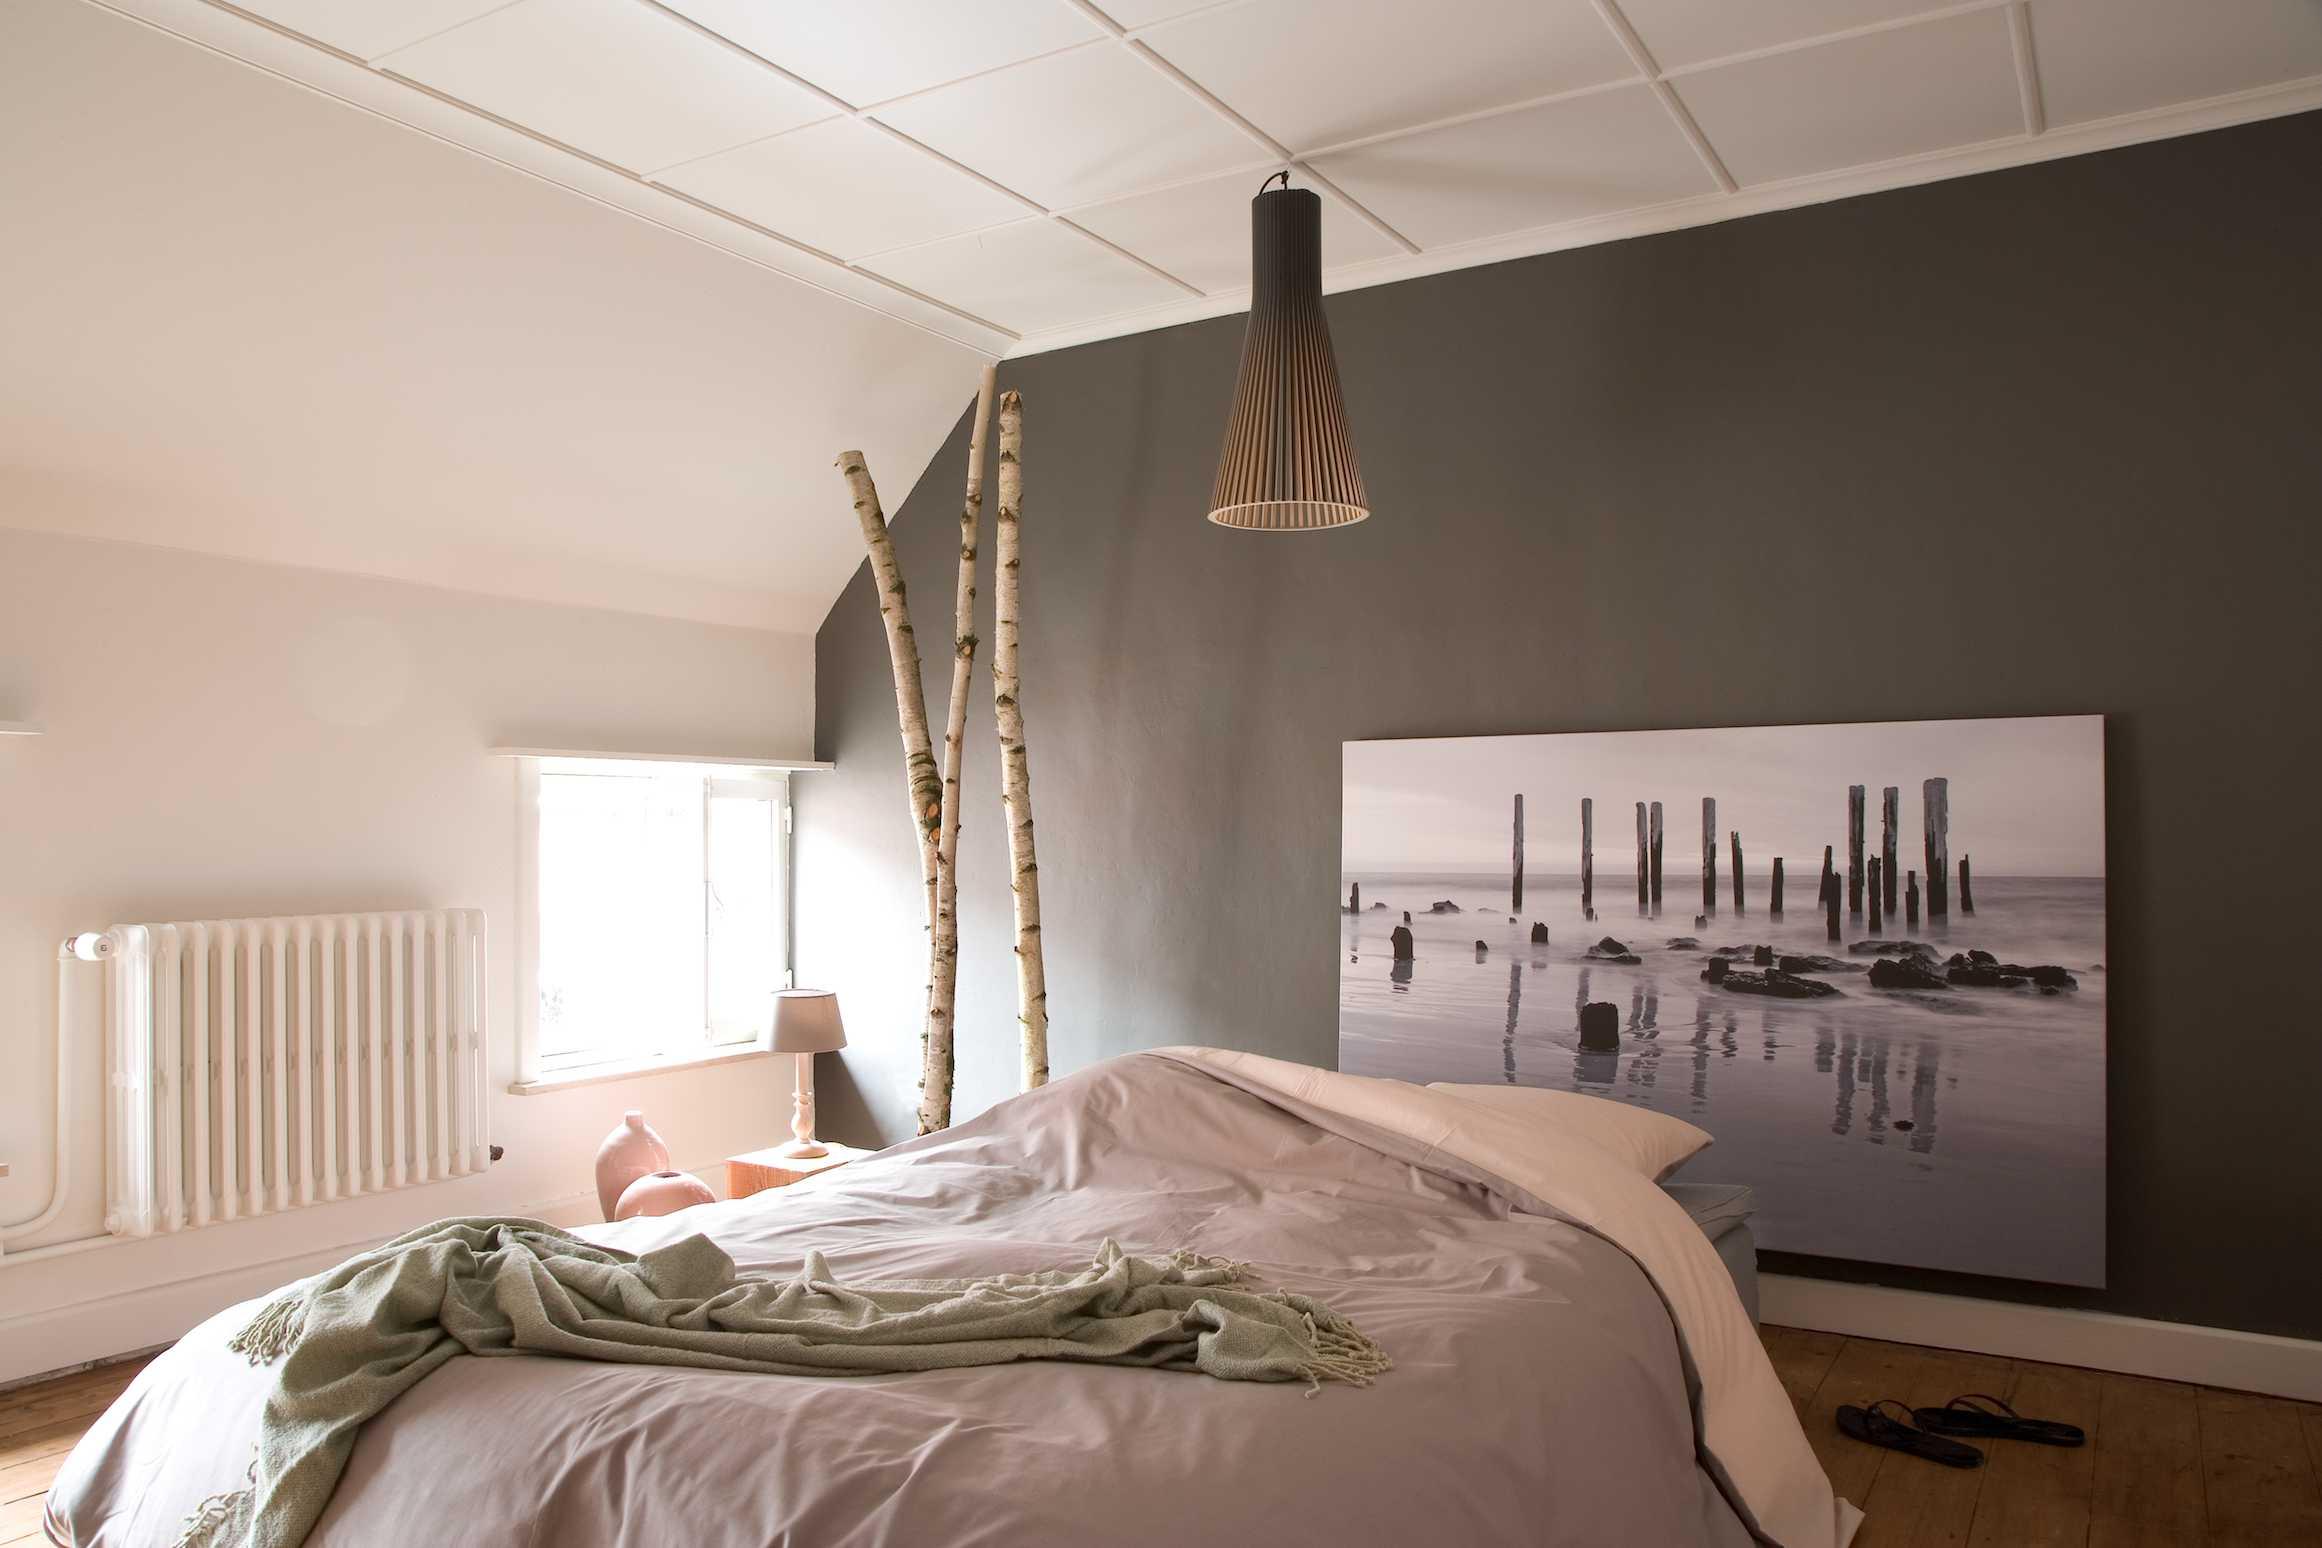 Landelijk tijdloos boss paints benedict huysentruyt verf coffee lover tc88 we m25 white wedding - Kleurenpalet kamer verf ...